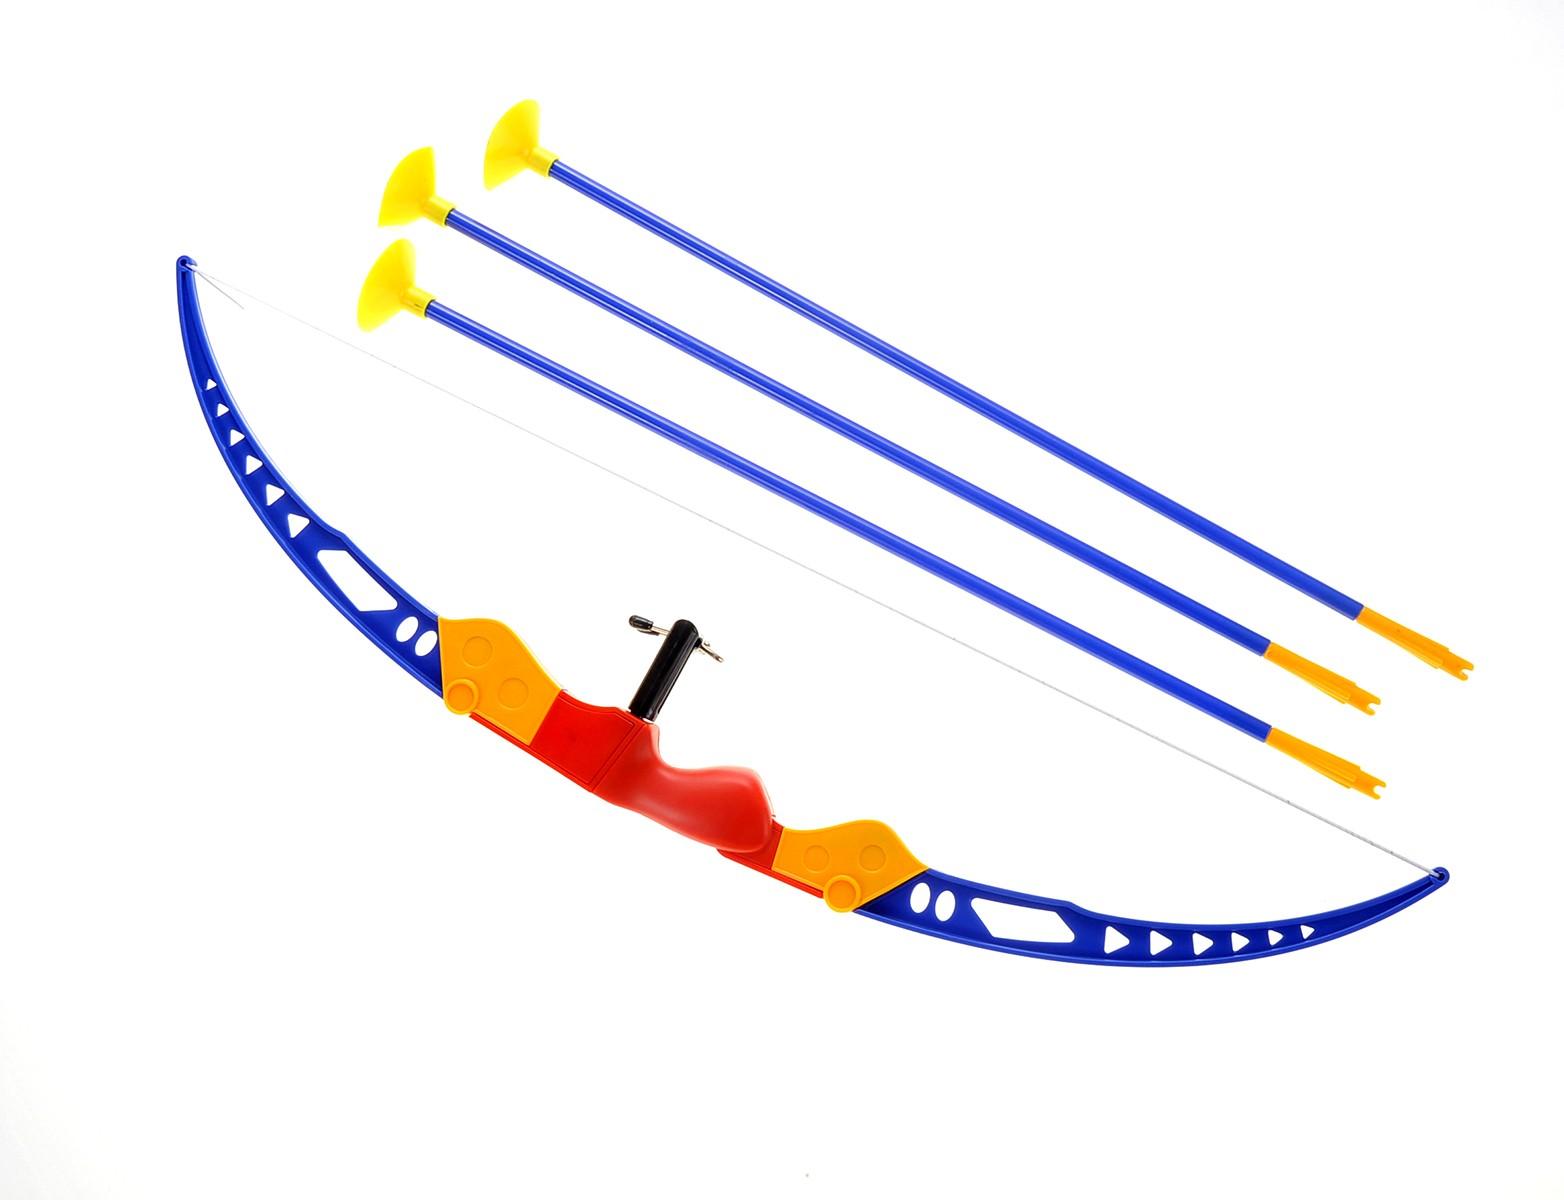 Sport Super Toy Bow and Arrow Dart Playset w/ Suction Dart Arrows